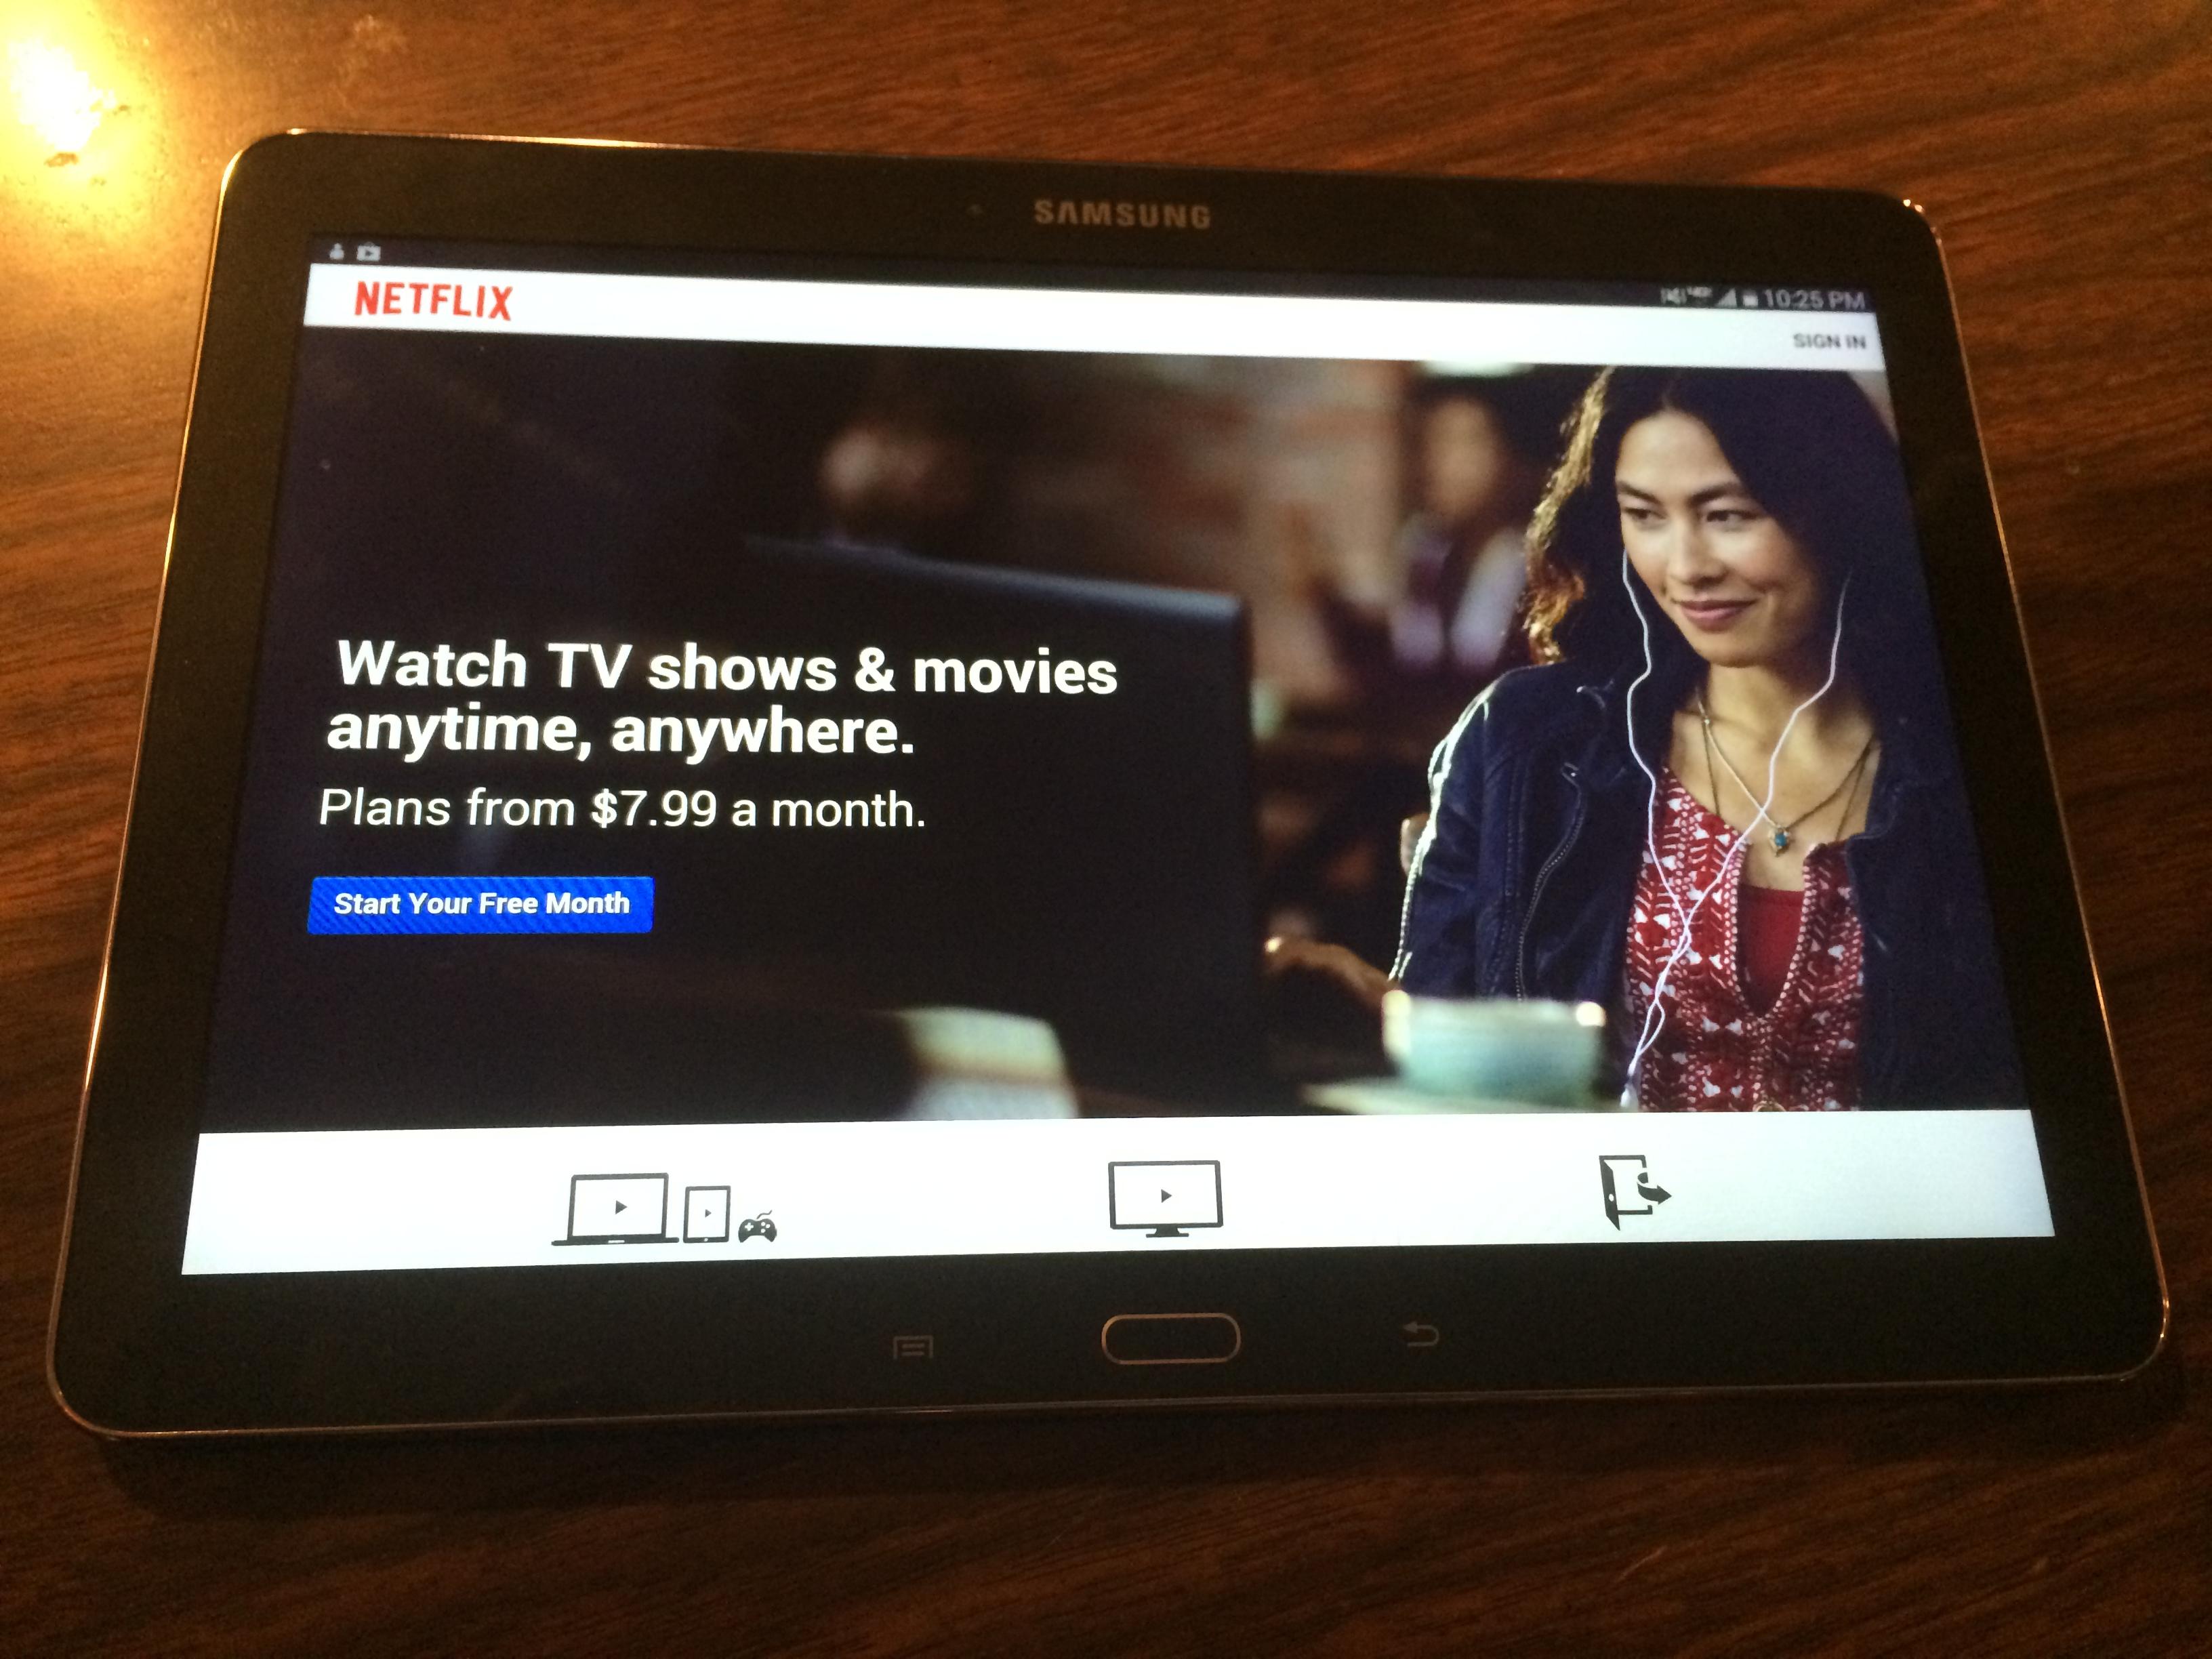 Netflix on Samsung